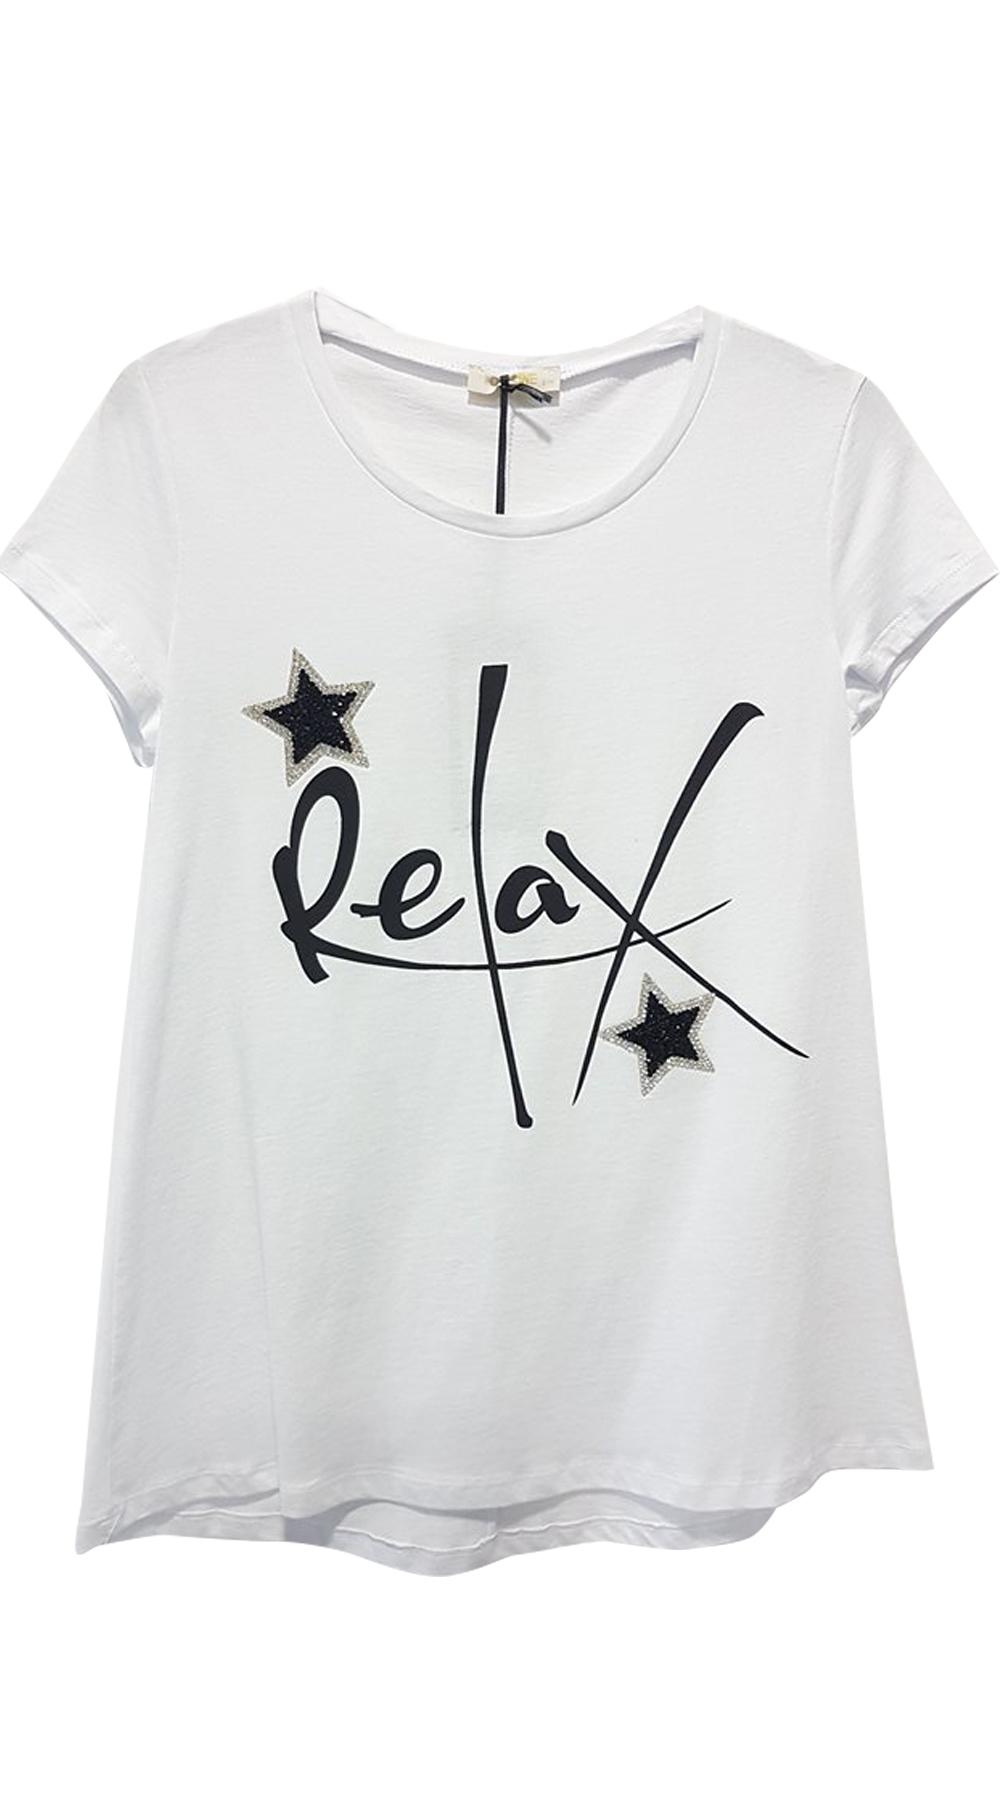 1f8267b82185 Γυναικείο basic t-shirt